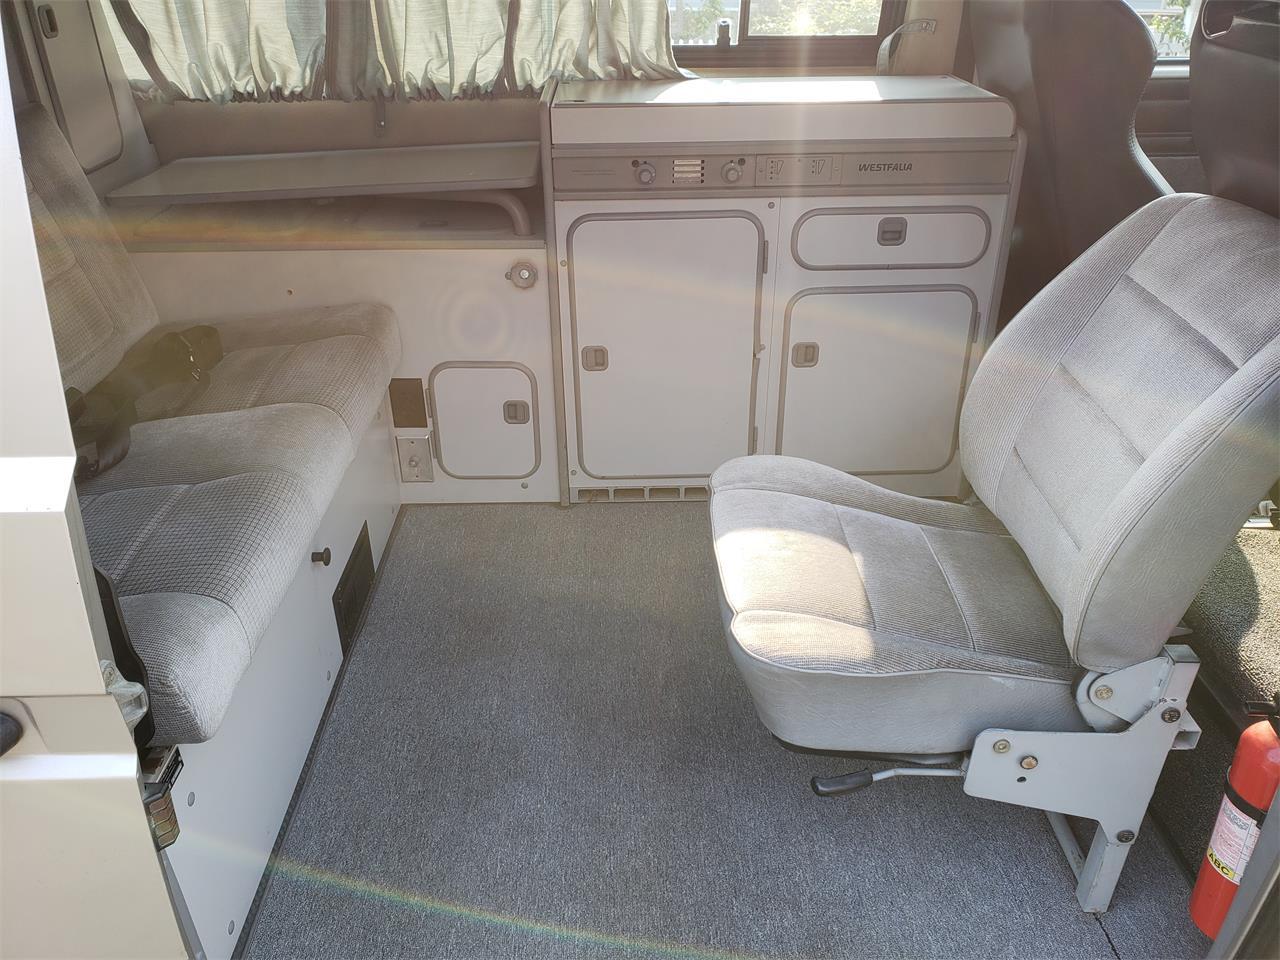 1991 Volkswagen Vanagon for Sale | ClassicCars com | CC-1175463